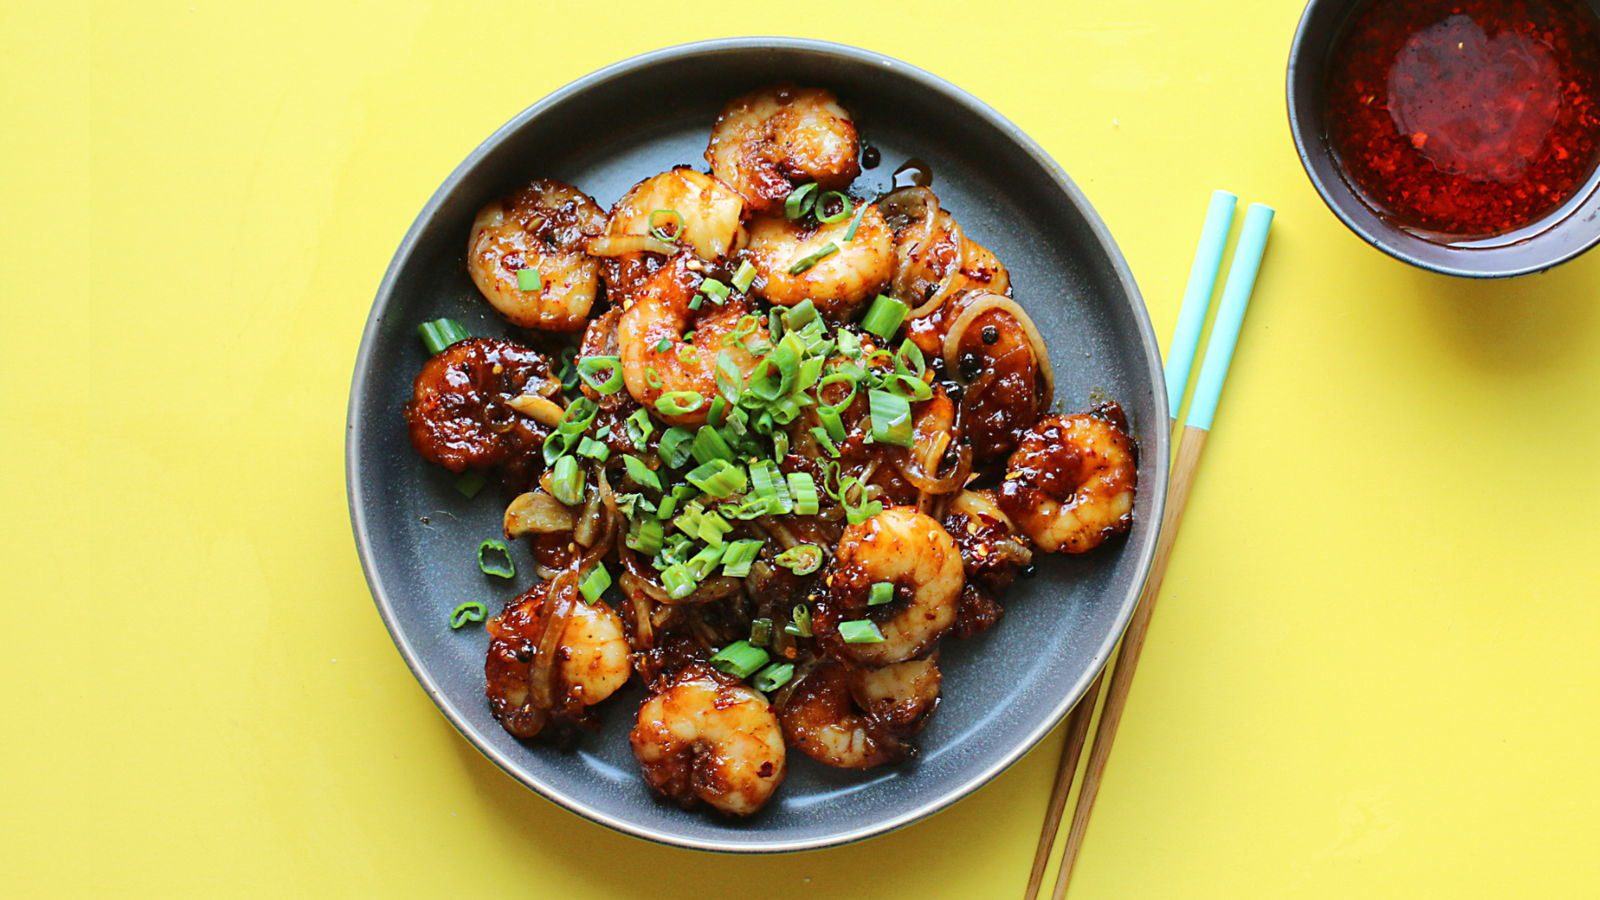 Firecracker Shrimps